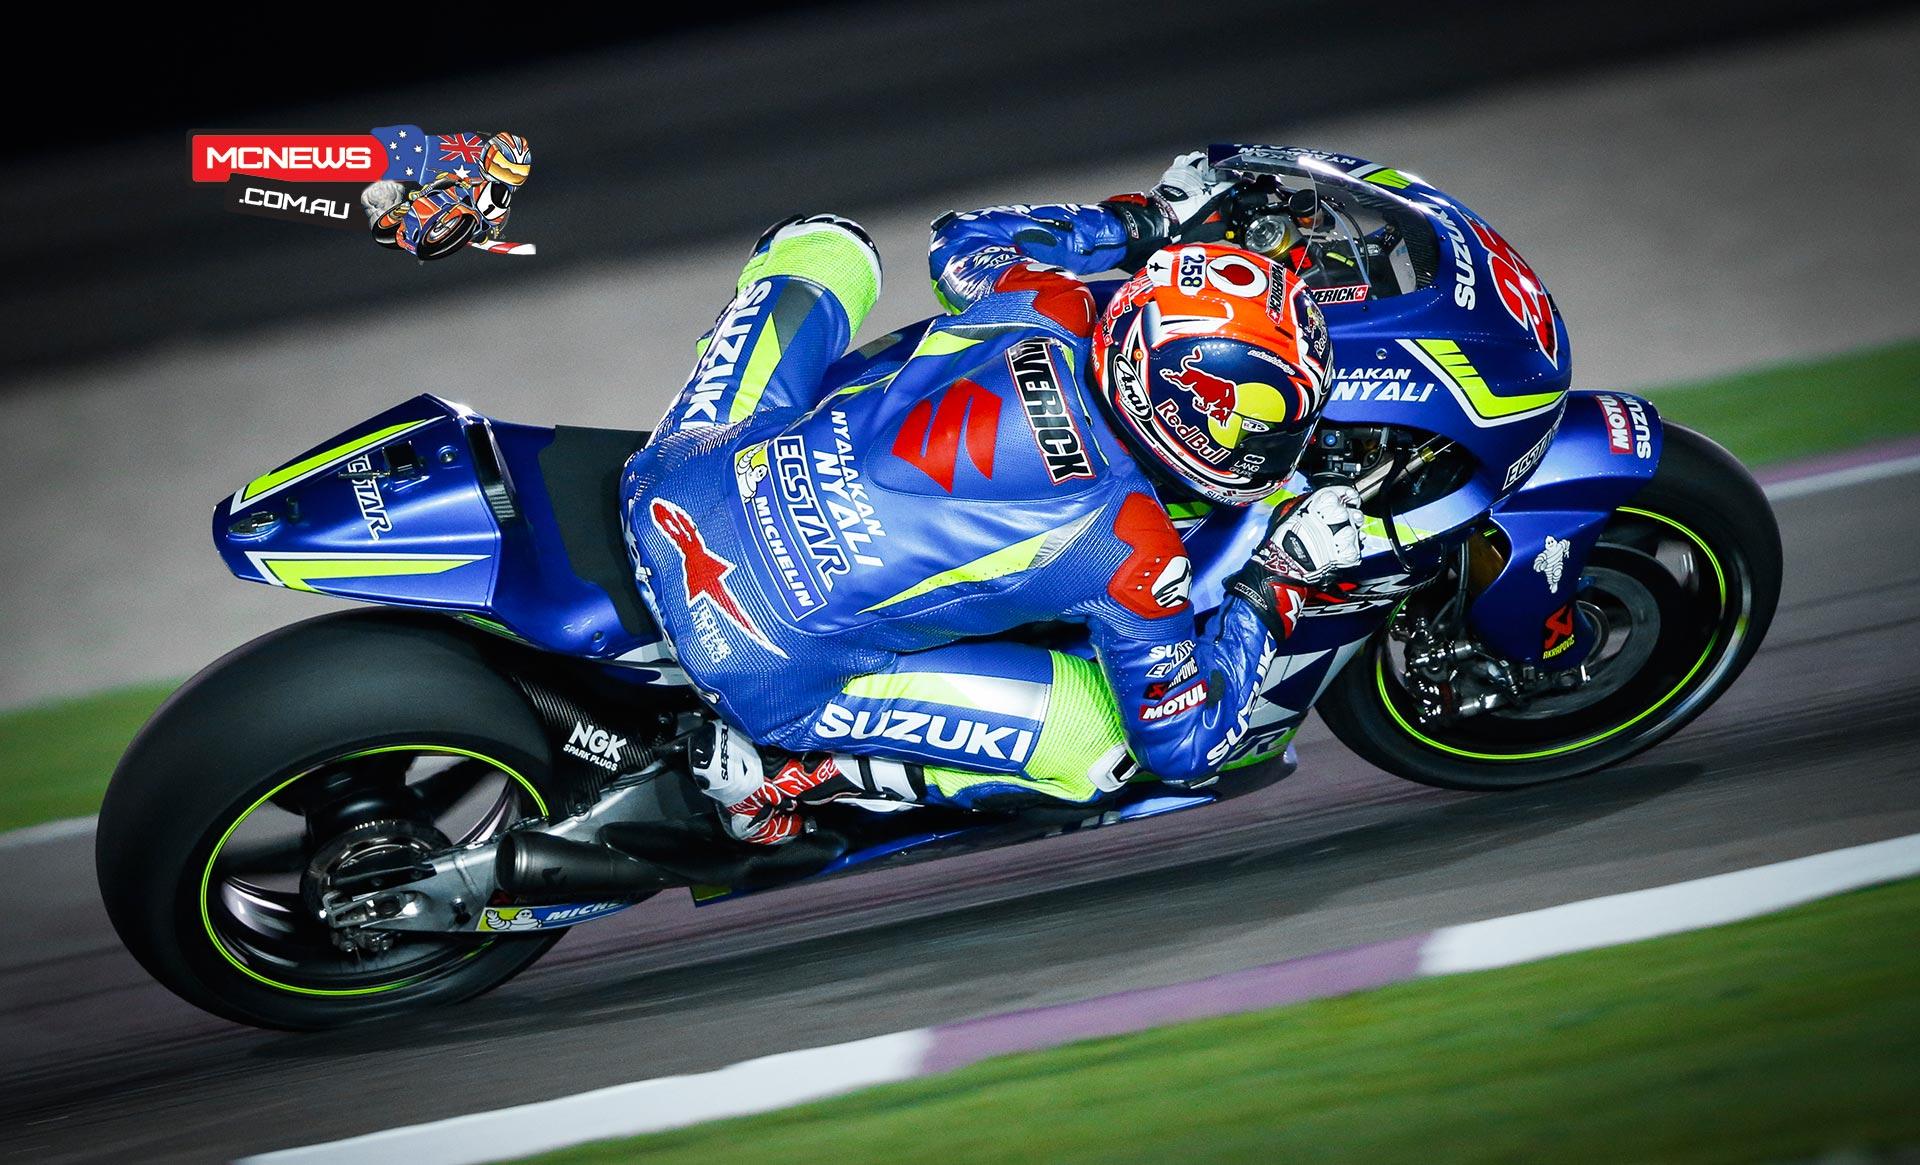 Jorge Lorenzo tops Qatar MotoGP Test | MCNews.com.au